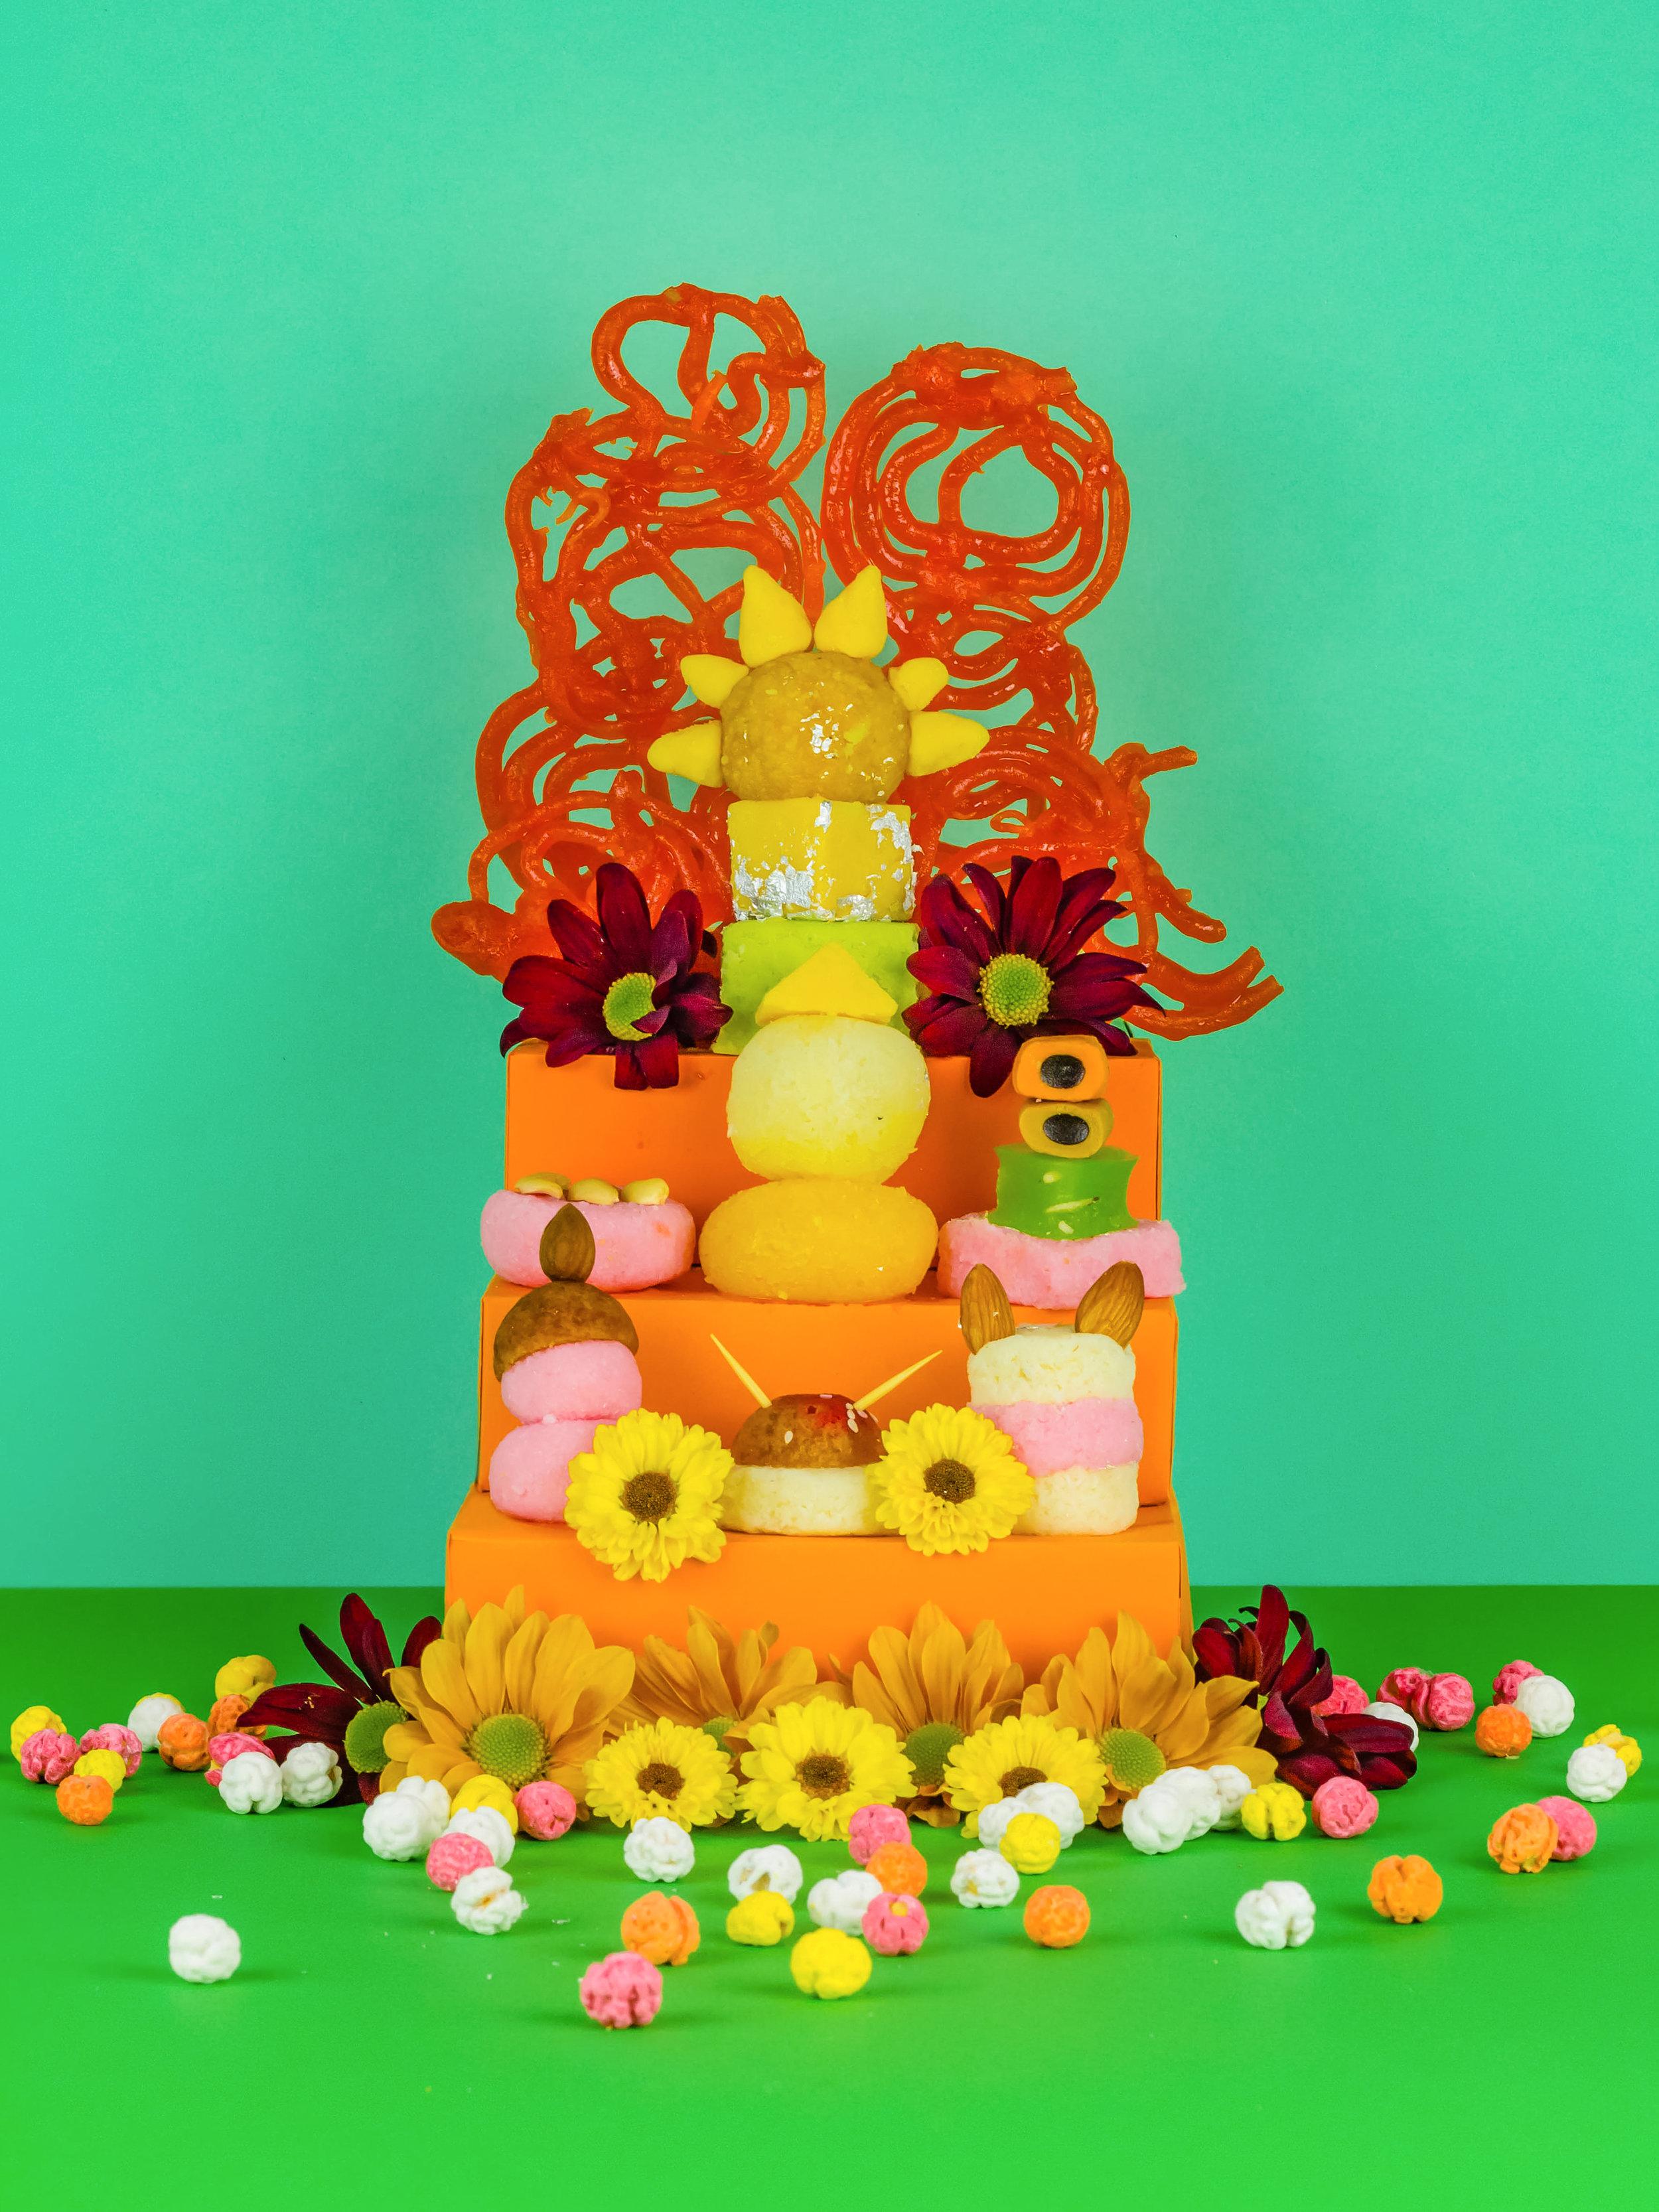 PedestaledMemory_Sweets_RGB.jpg